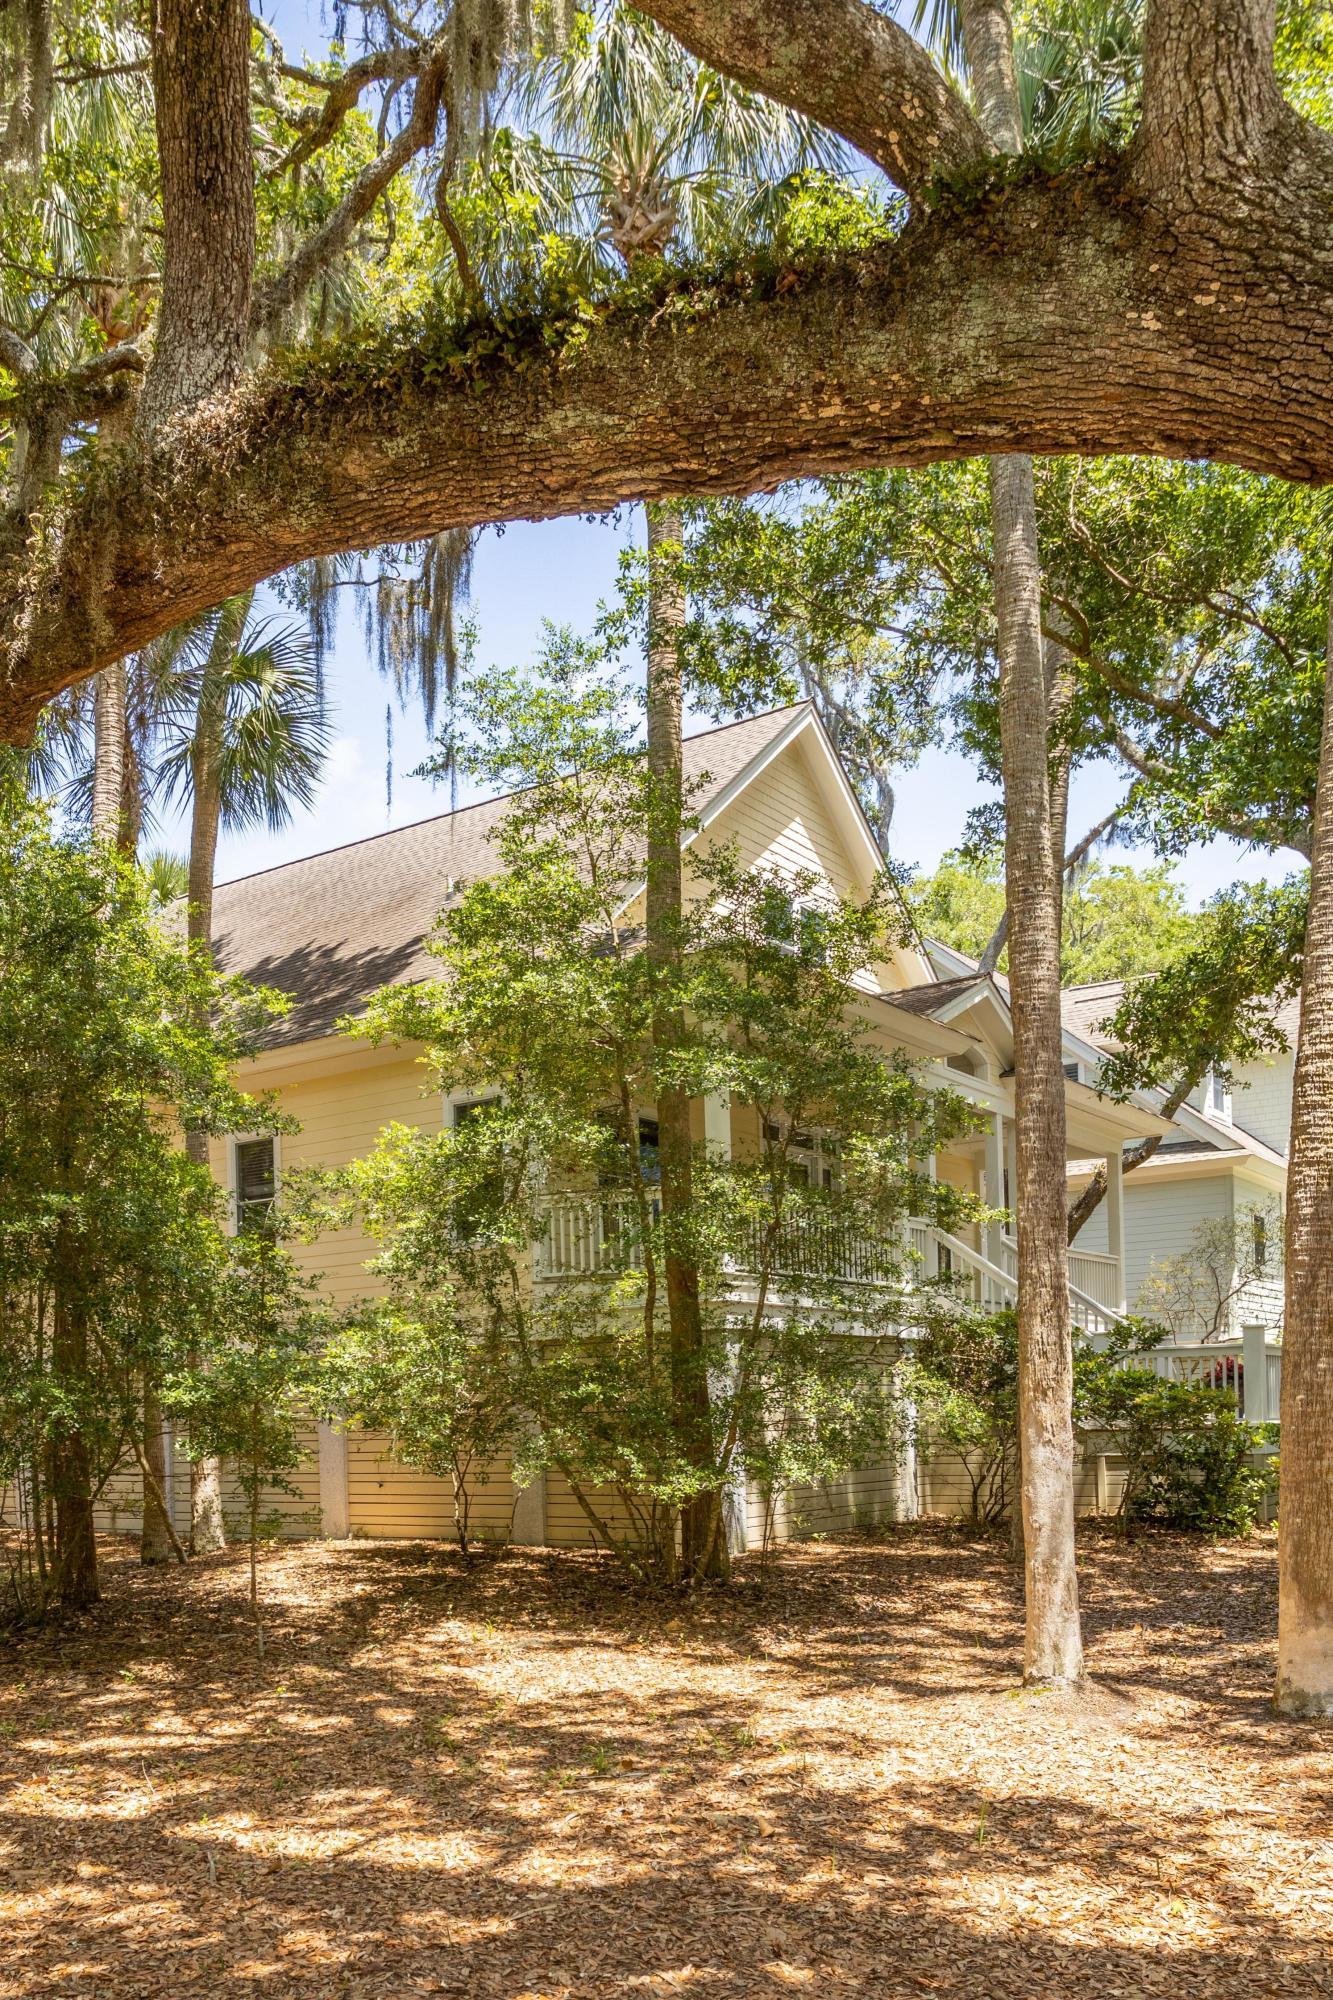 Seabrook Island Homes For Sale - 1014 Crooked Oaks, Seabrook Island, SC - 10